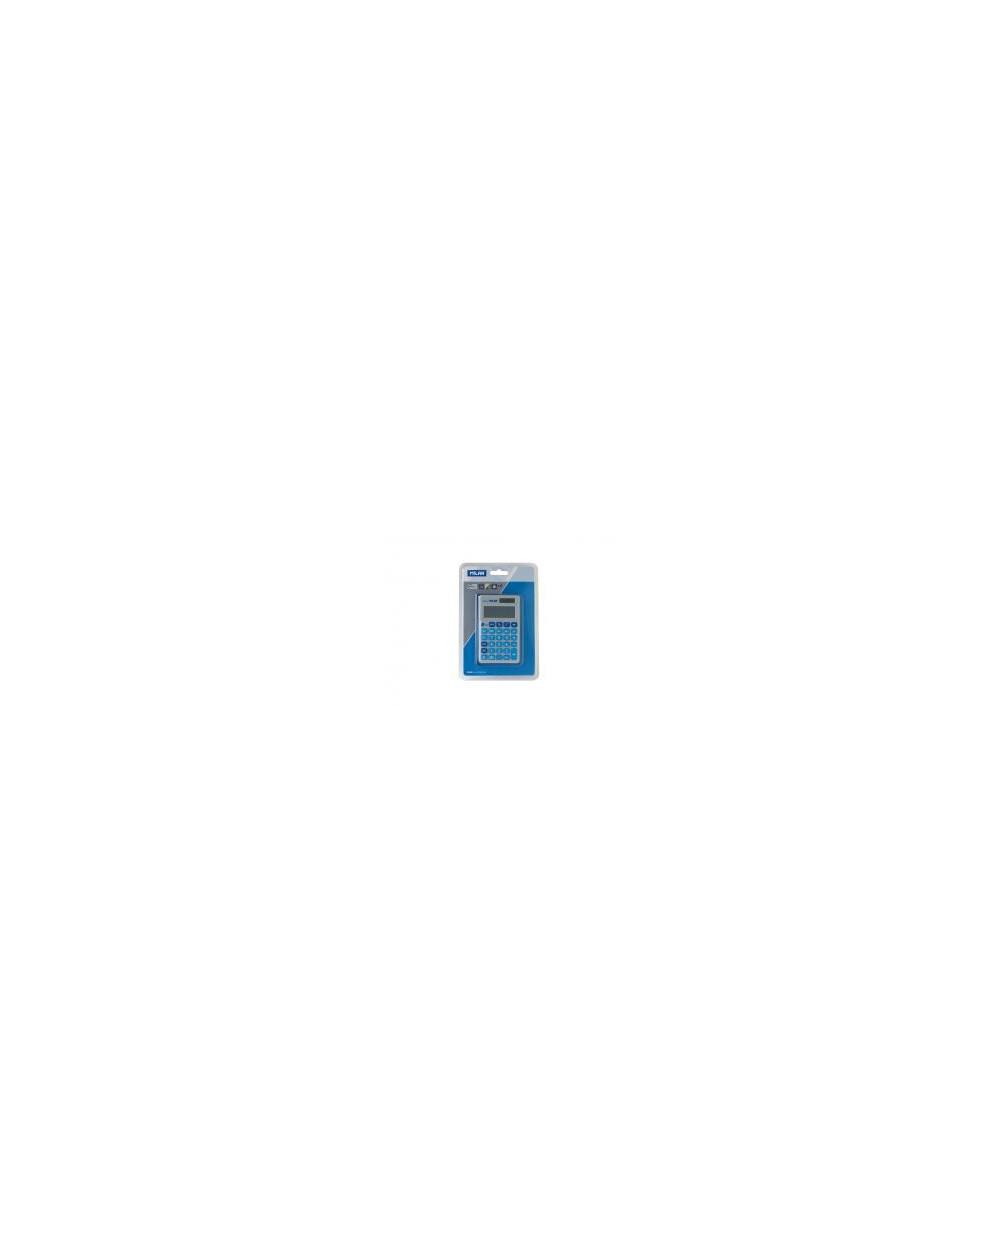 Калкулатор MILAN, 12 разр., 117х67х9, черен капак, сини бутони